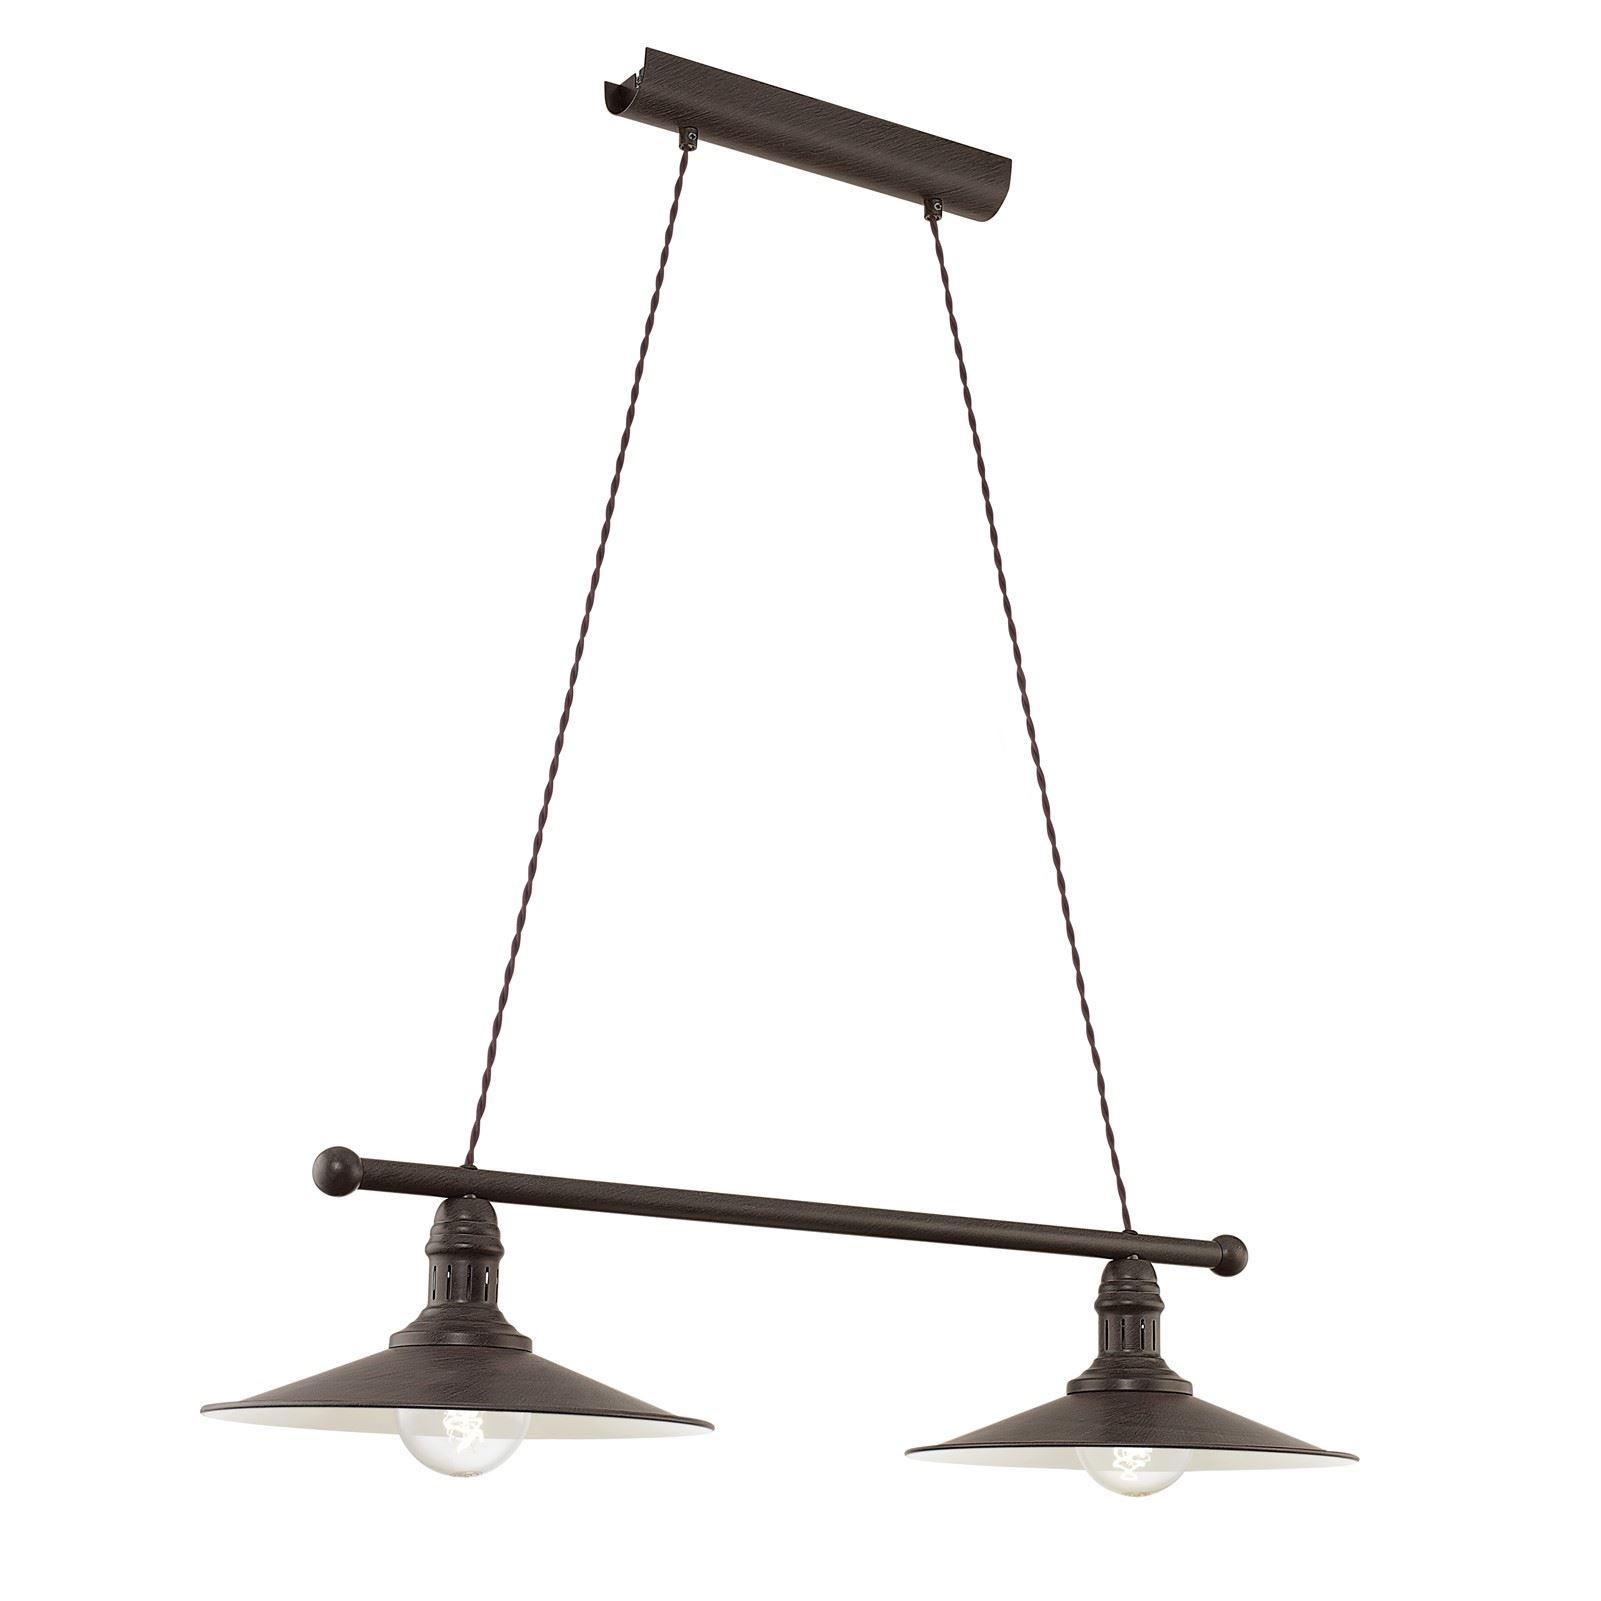 Stockbury Hanging Light 2 Light E27 Antique Brown Beige